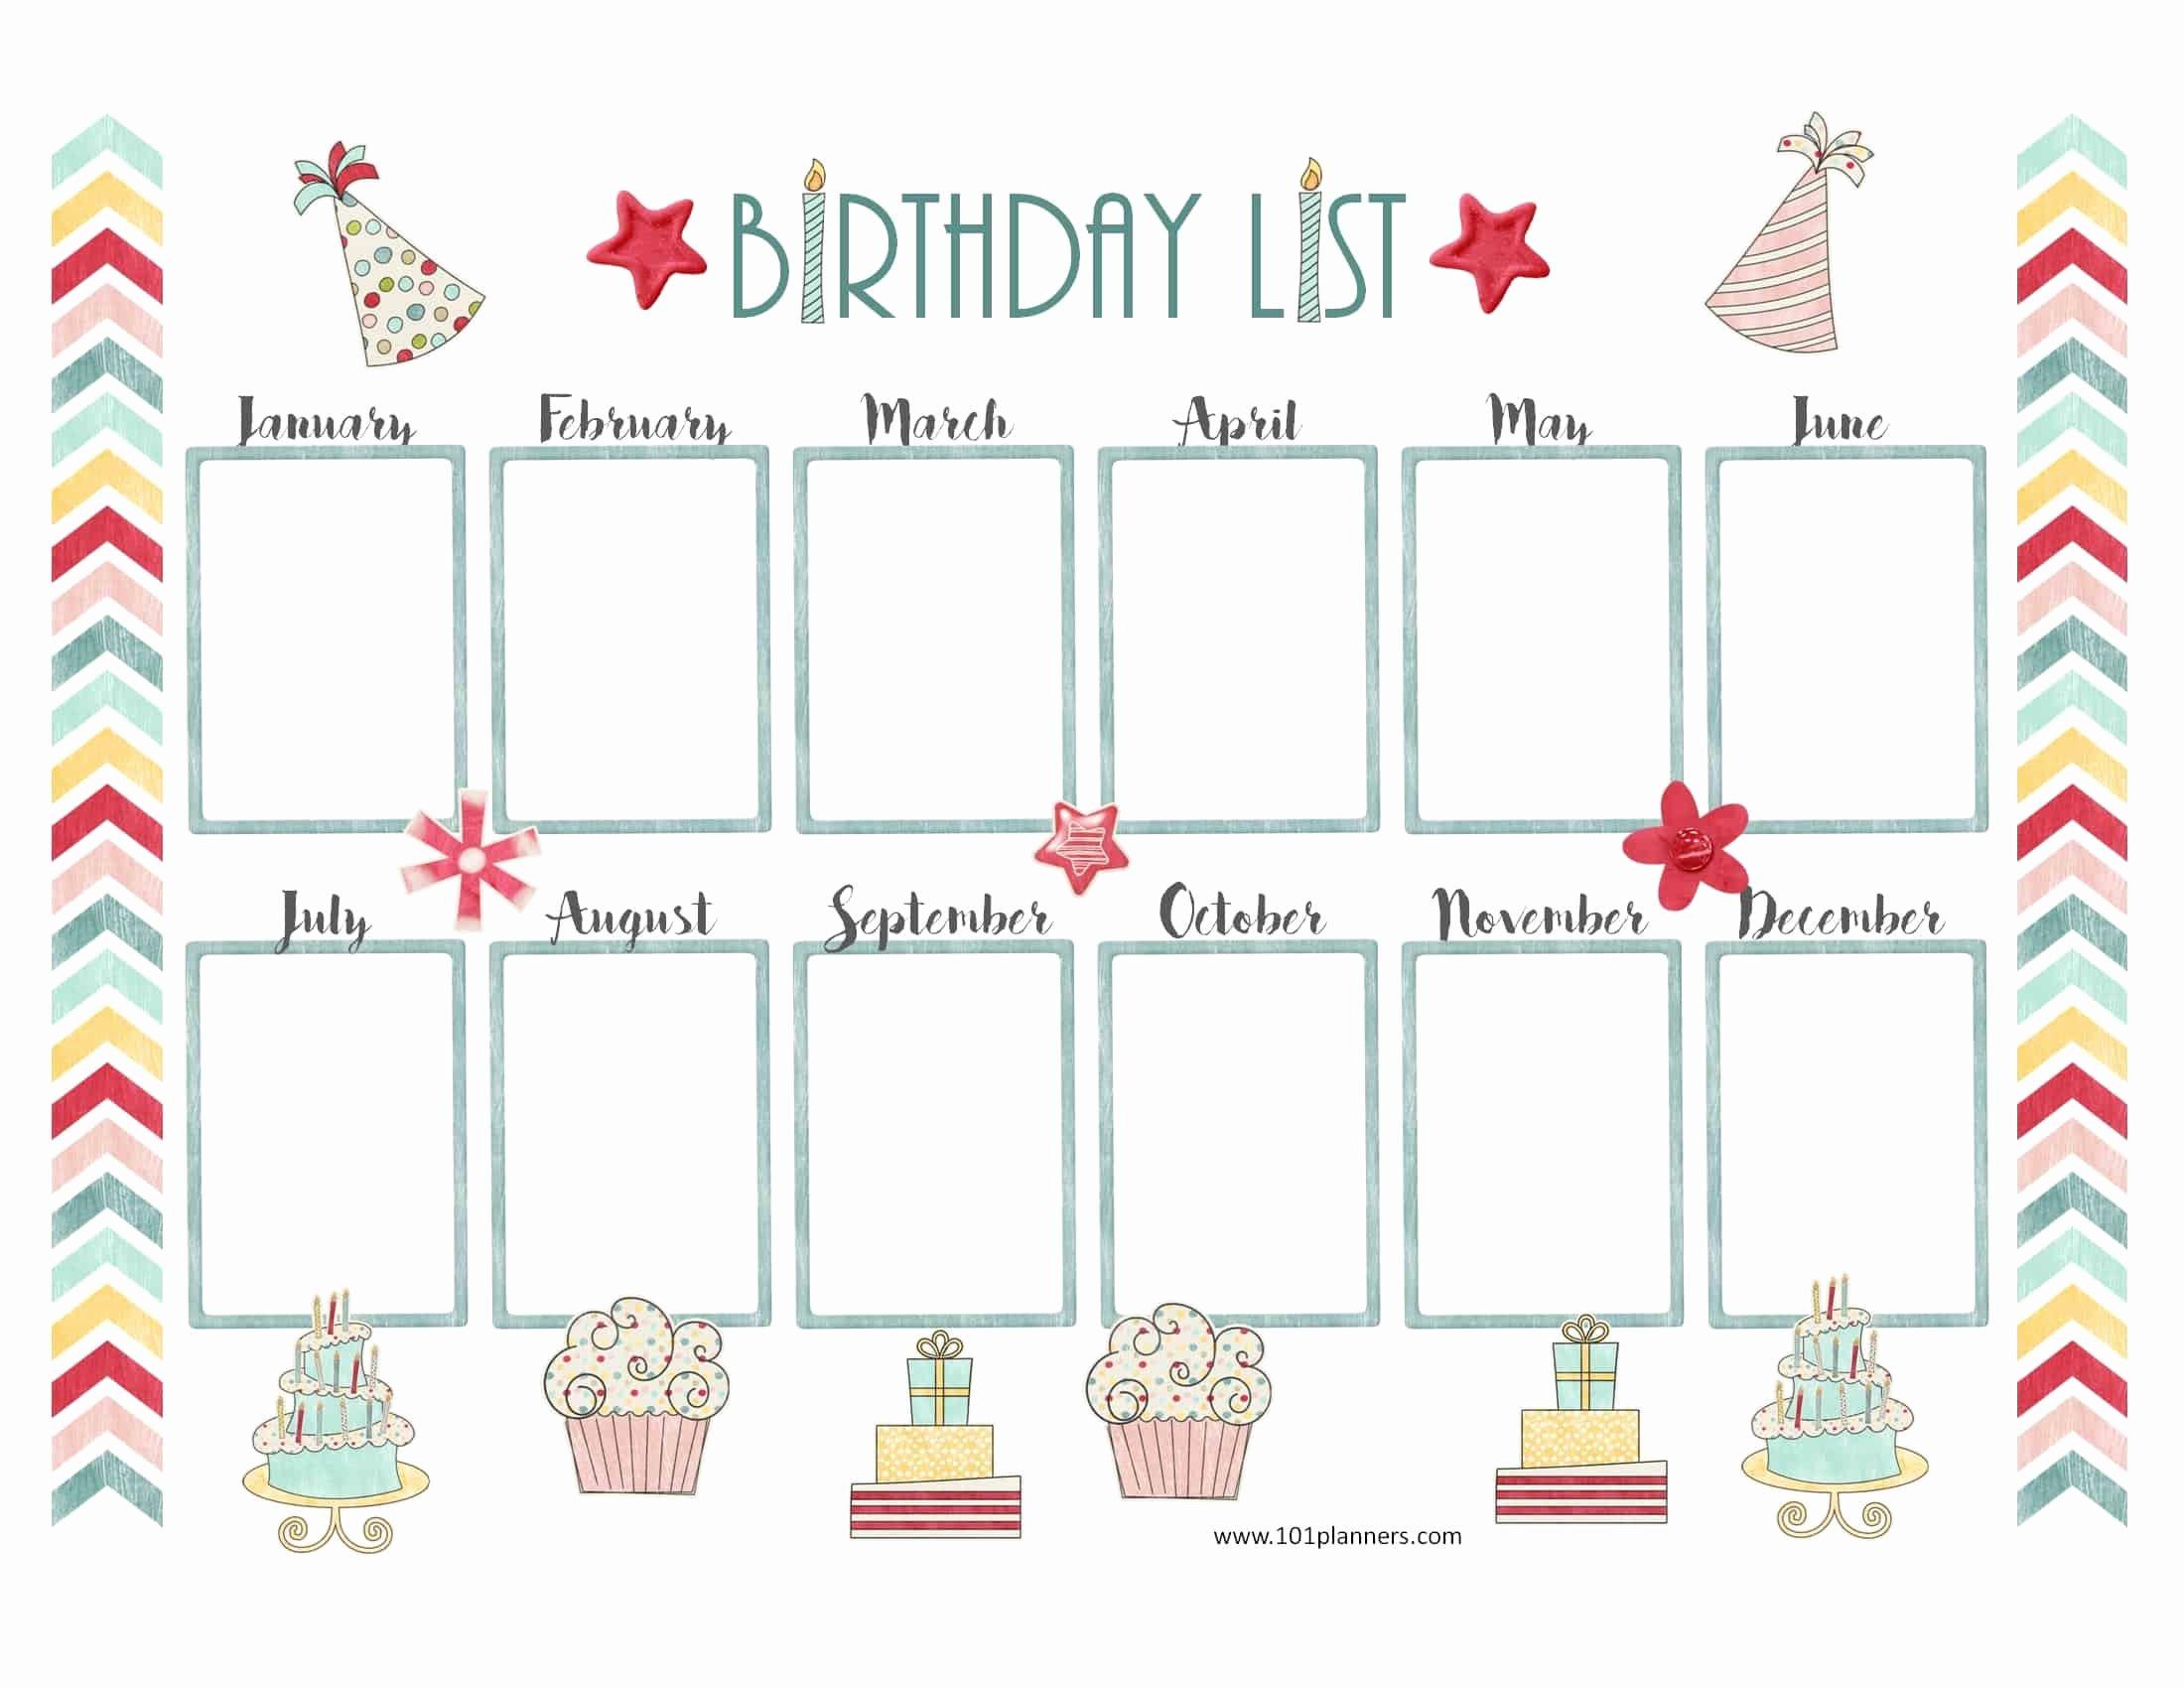 Free Happy Birthday Template Luxury Free Birthday Calendar Printable & Customizable